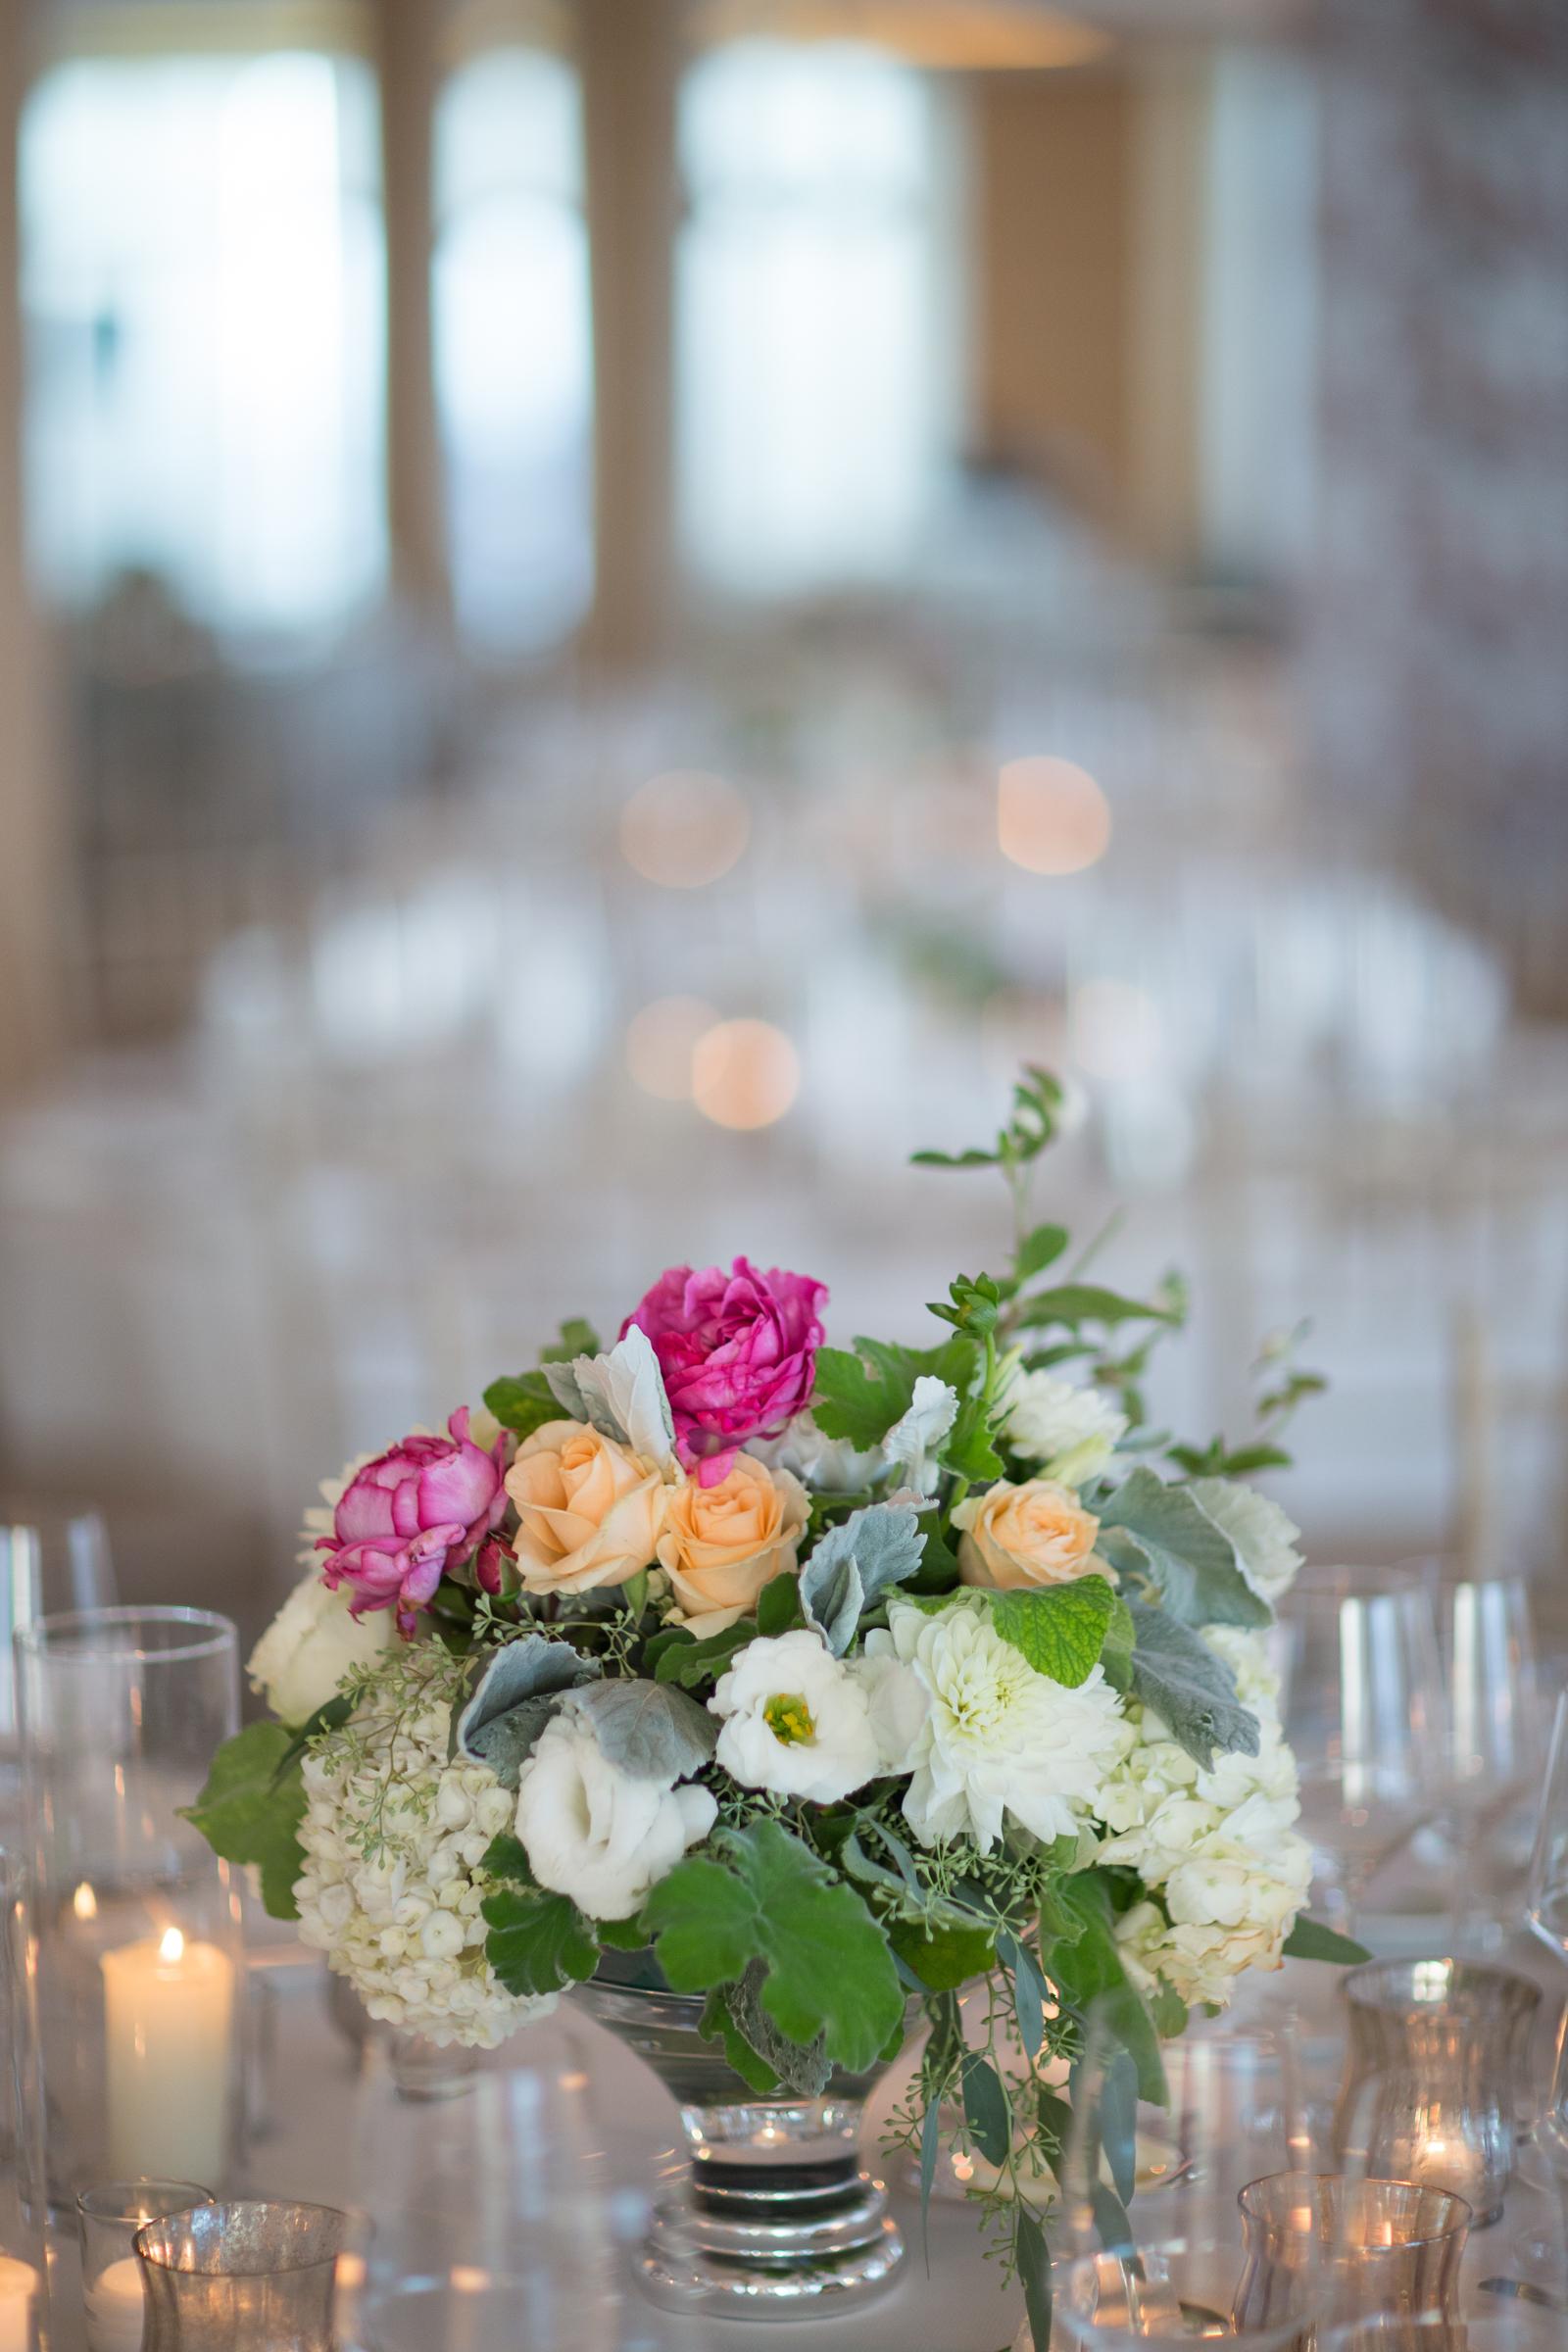 magnoliaeventdesign.com | Bacara Resort Wedding | Melissa Musgrove Photography | Magnolia Event Design in Santa Barbara